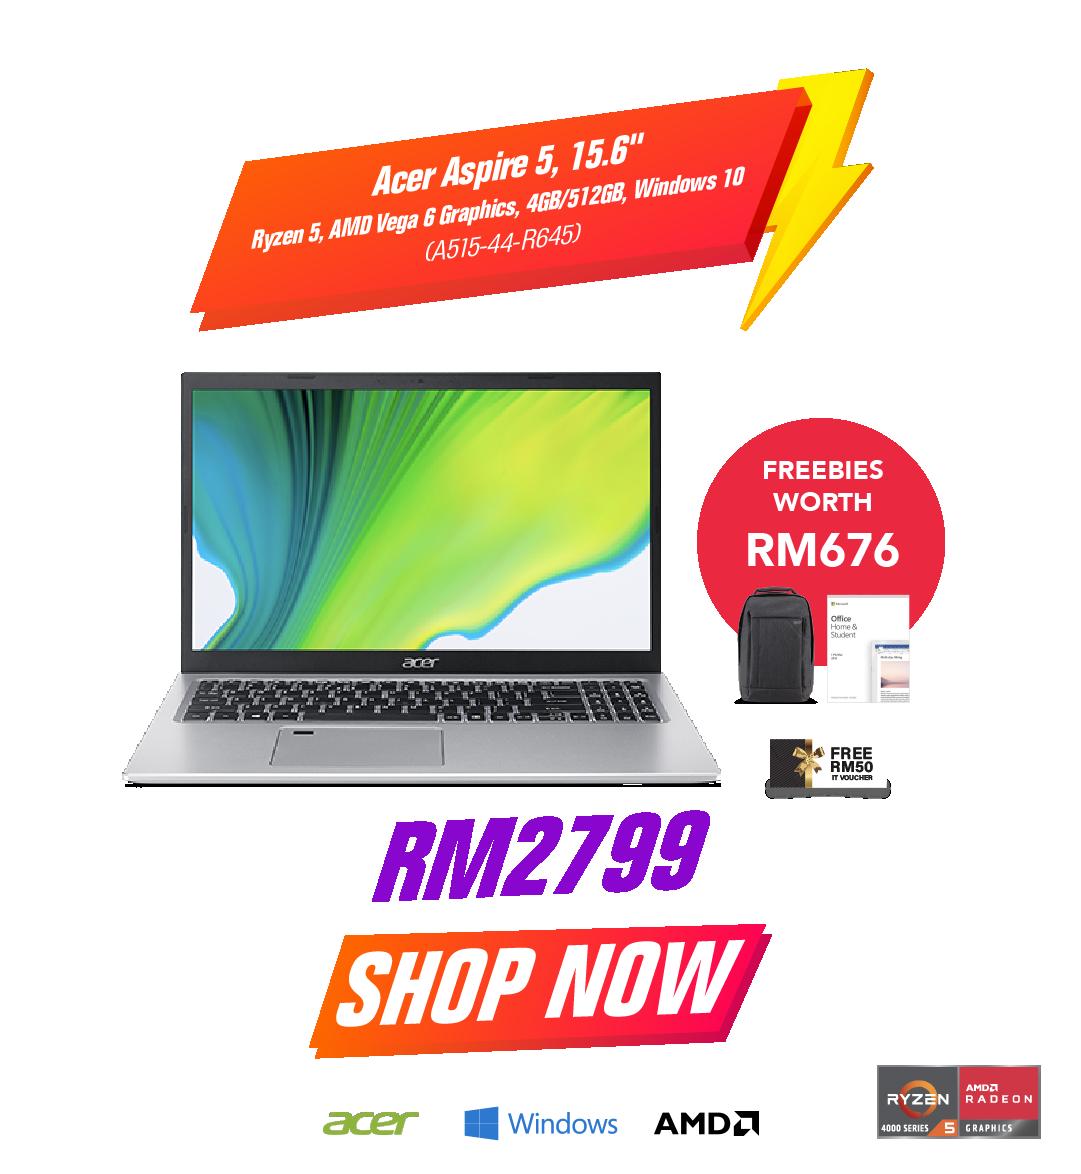 Acer Aspire 5 15.6 Ryzen 5 AMD Vega 6 Graphics 4GB/512GB Windows 10